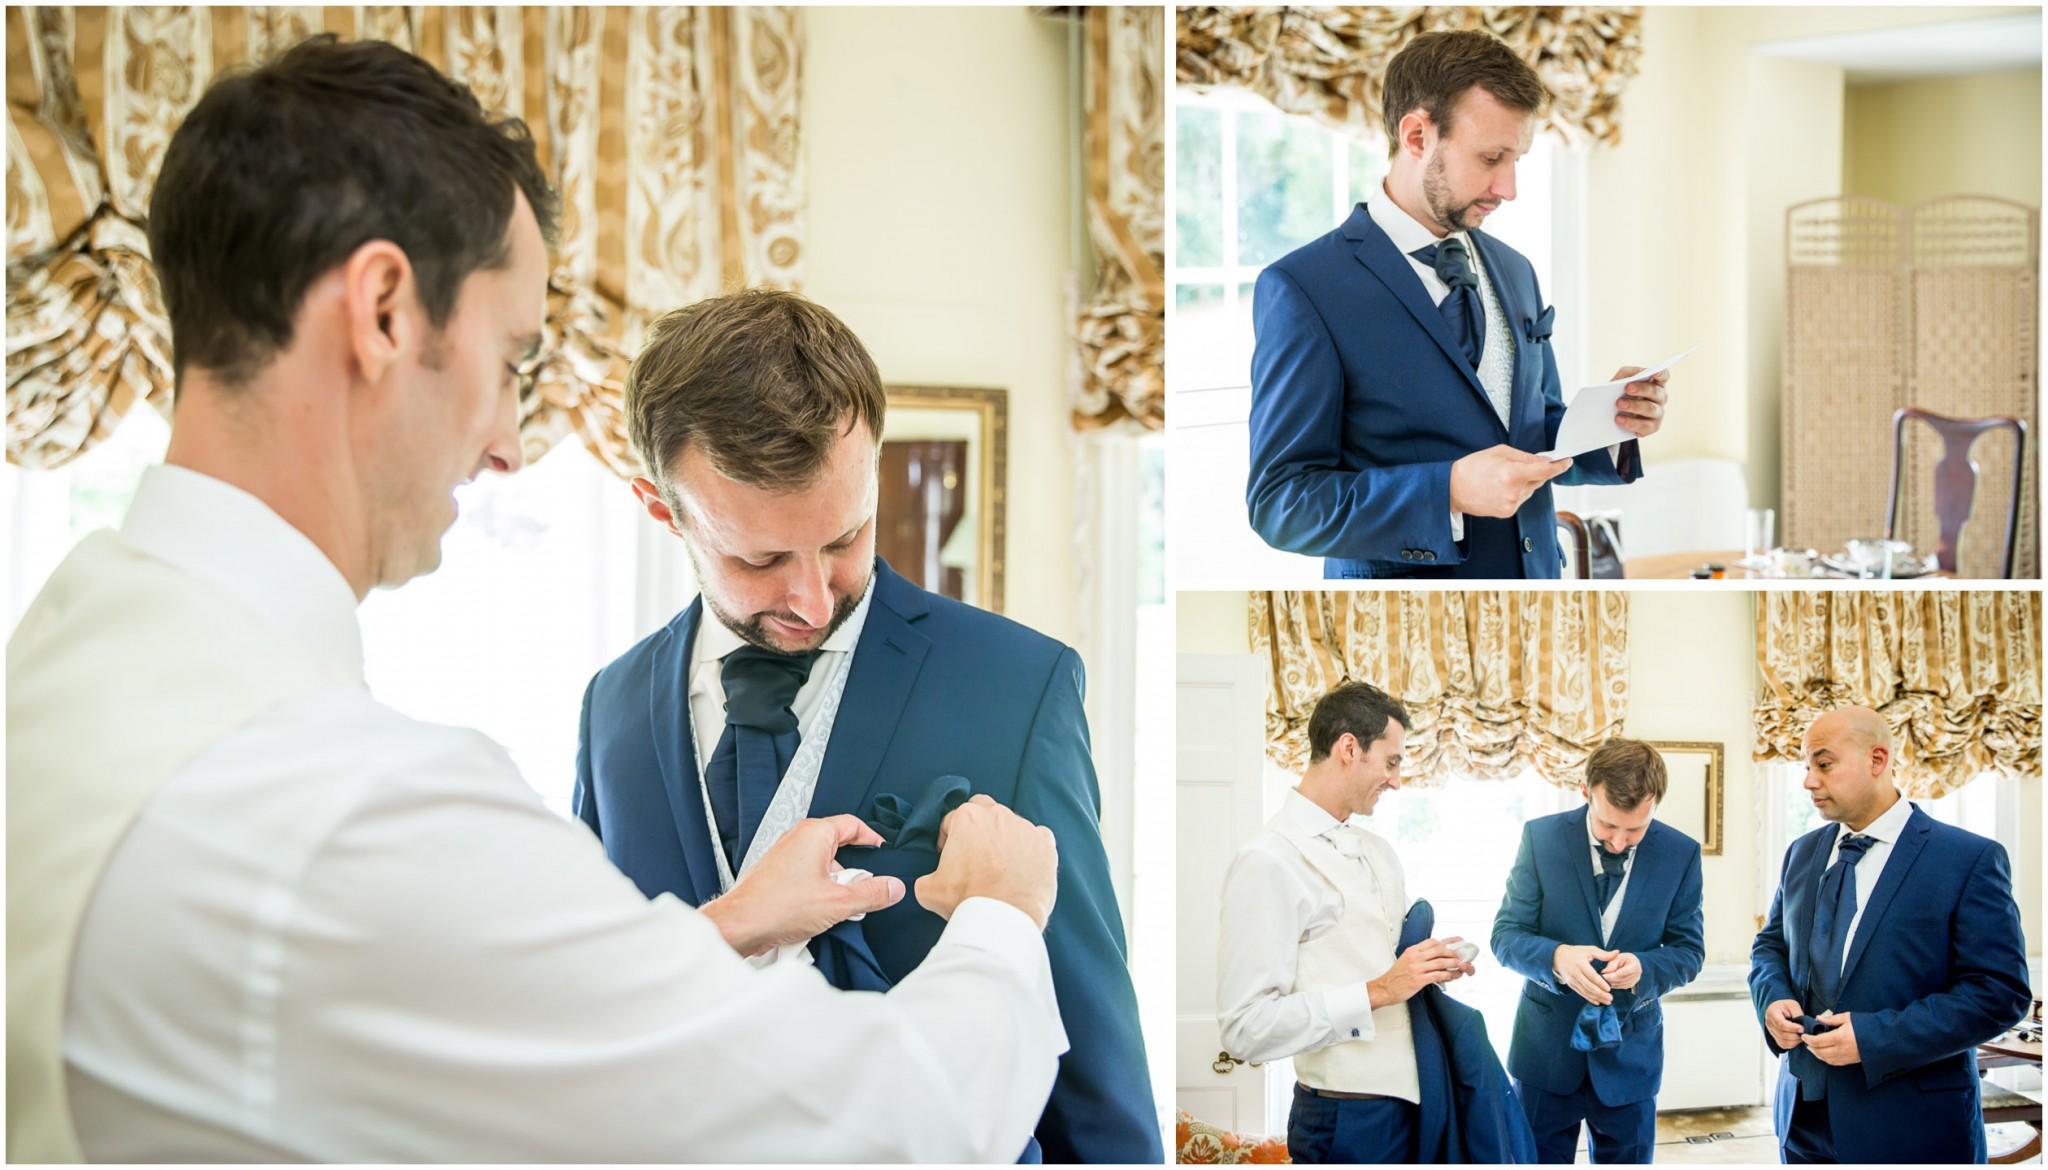 Avington Park Wedding Groom with Ushers